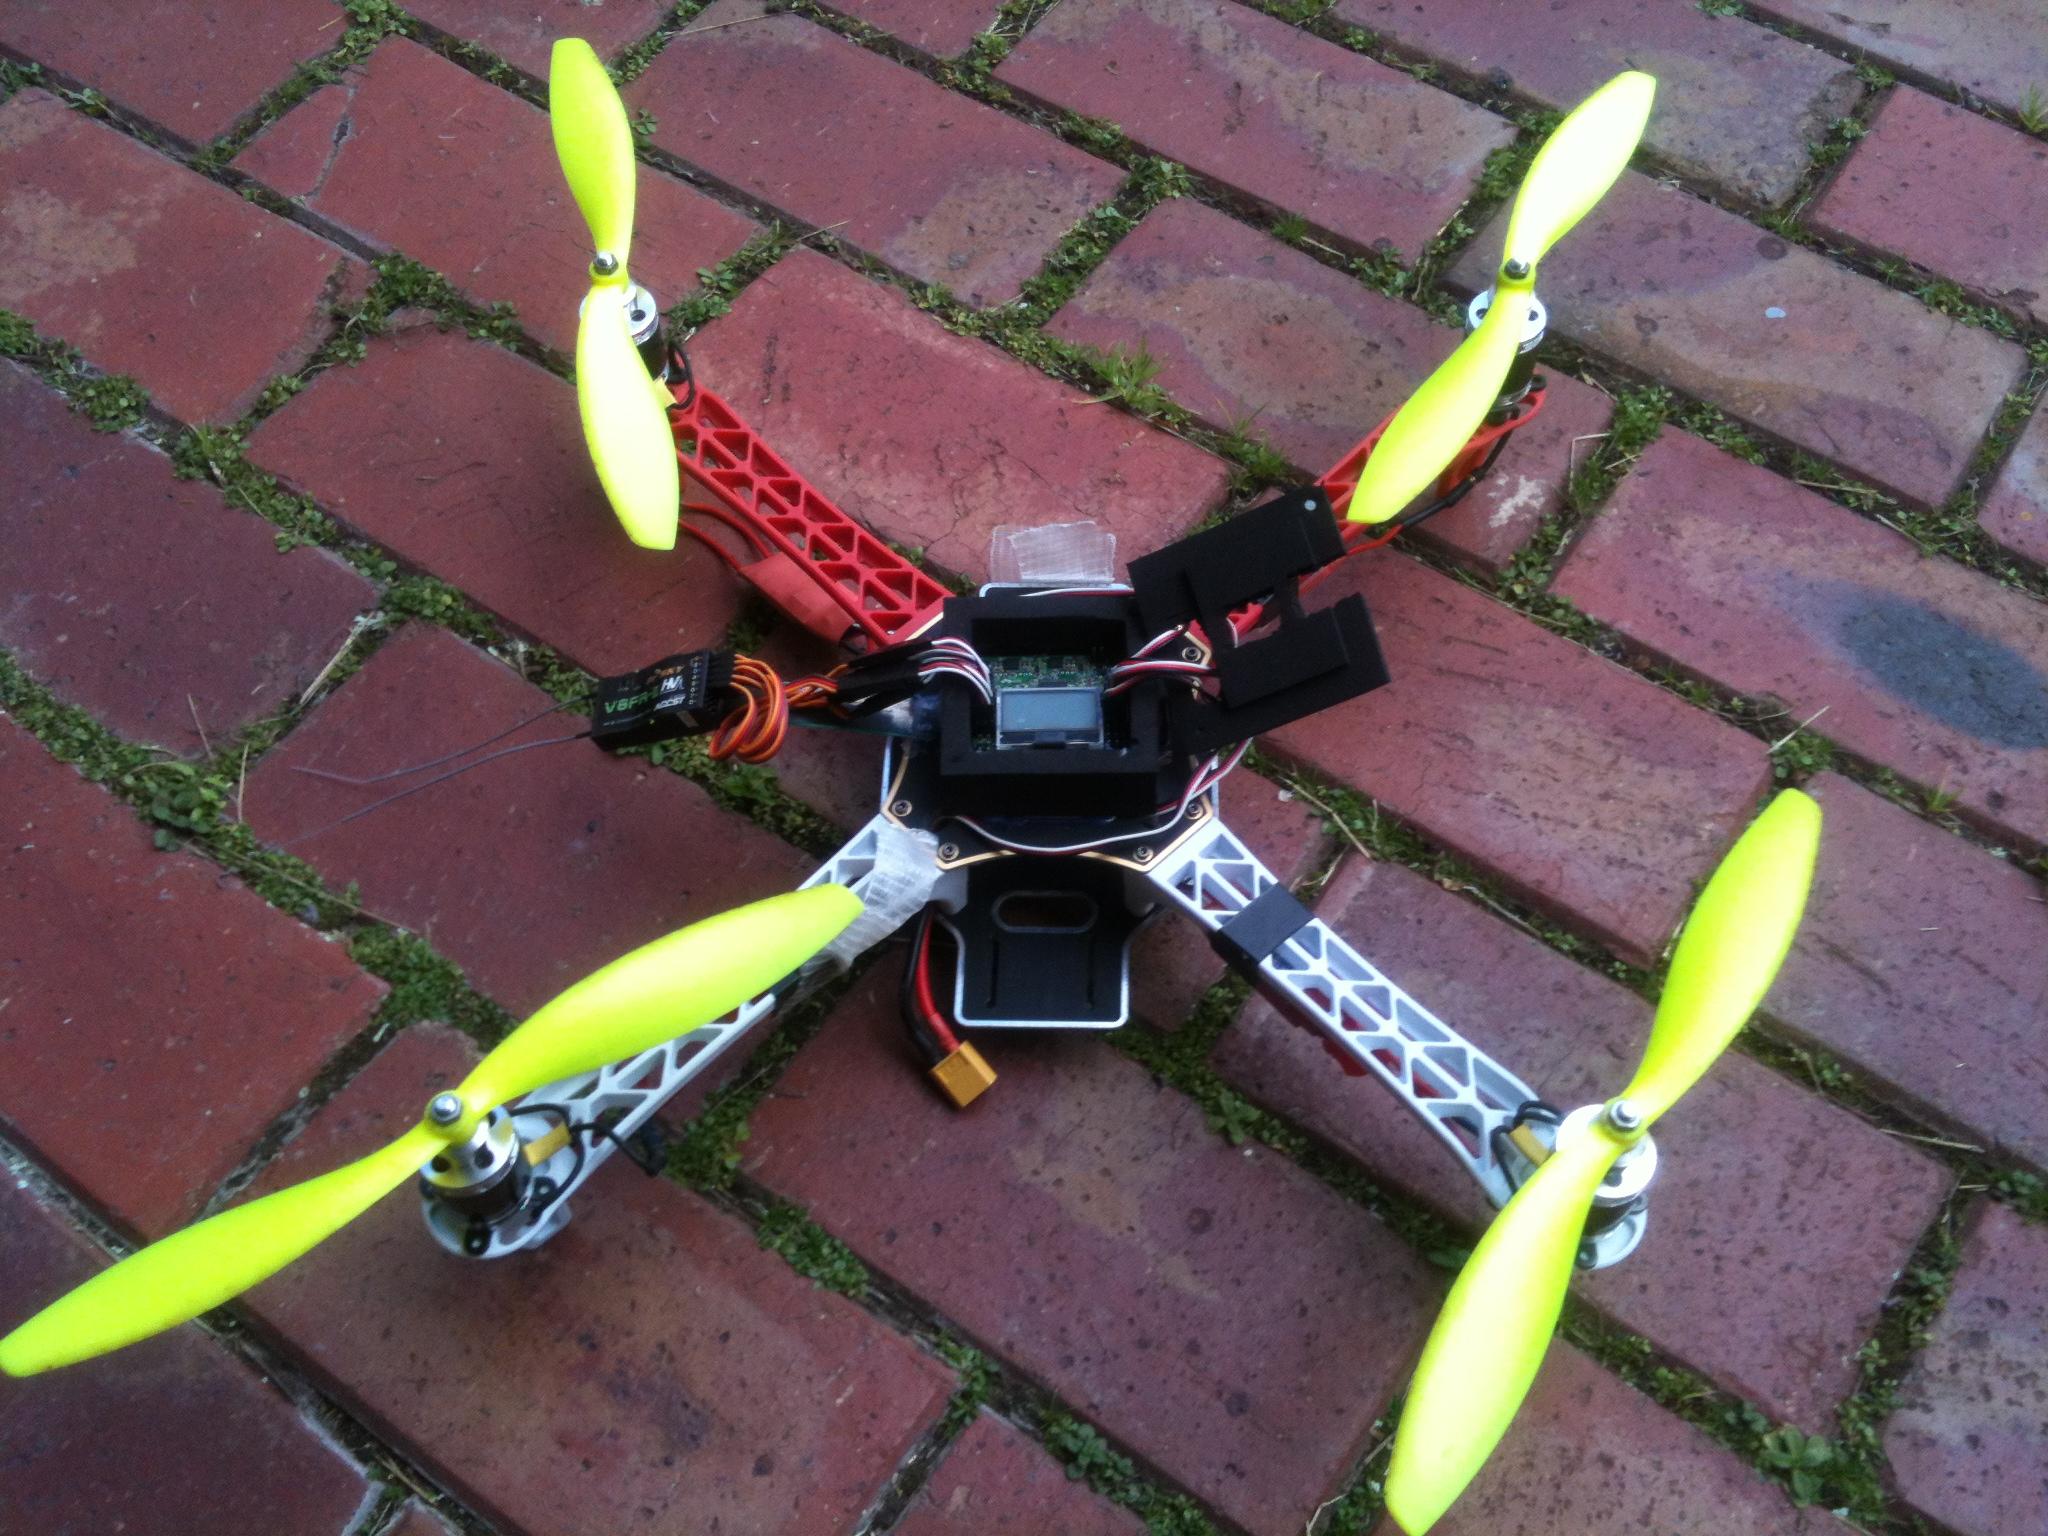 Building Quadcopters, Drones and Uav's- A explanation and easy build of a basic Quad.